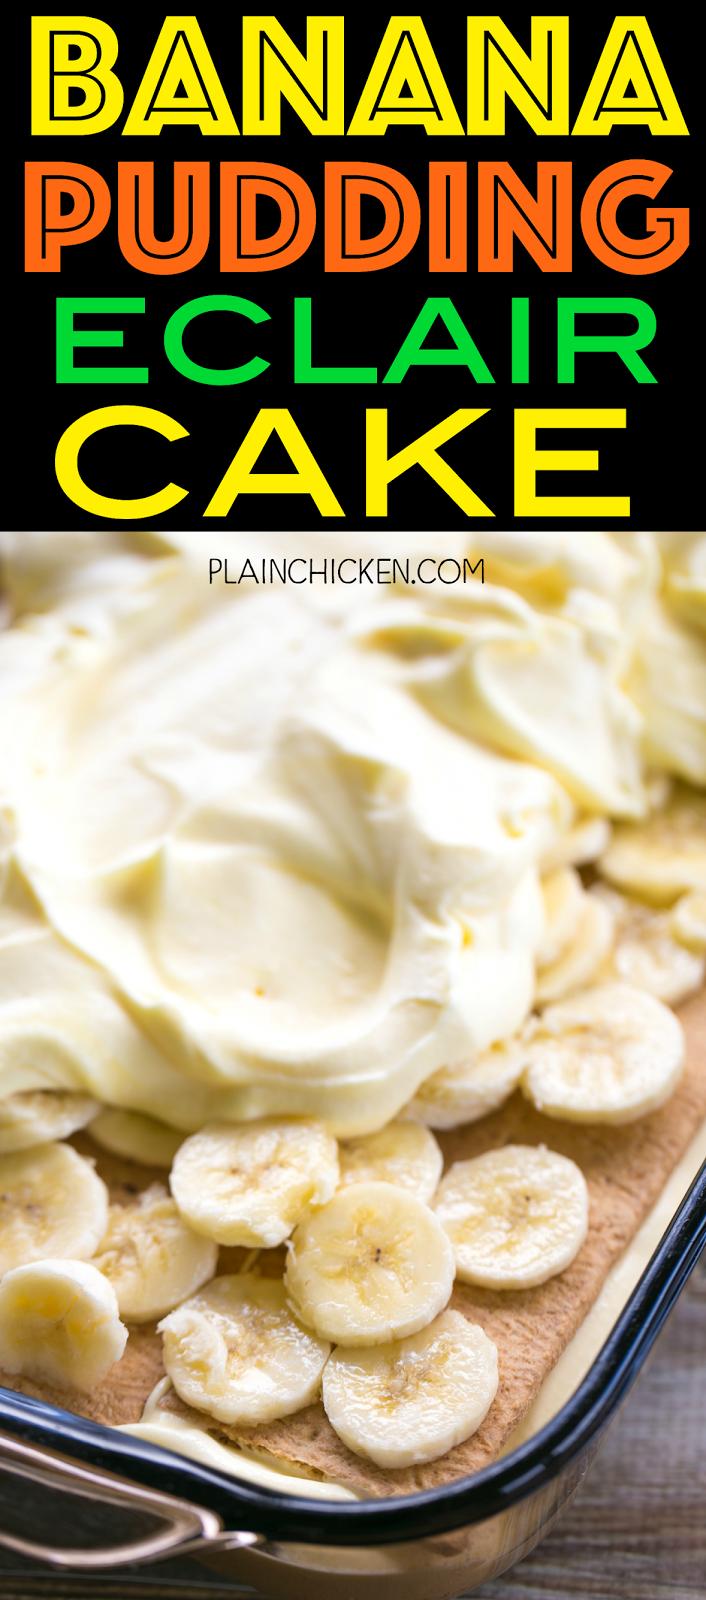 Banana Pudding Eclair Cake - Plain Chicken